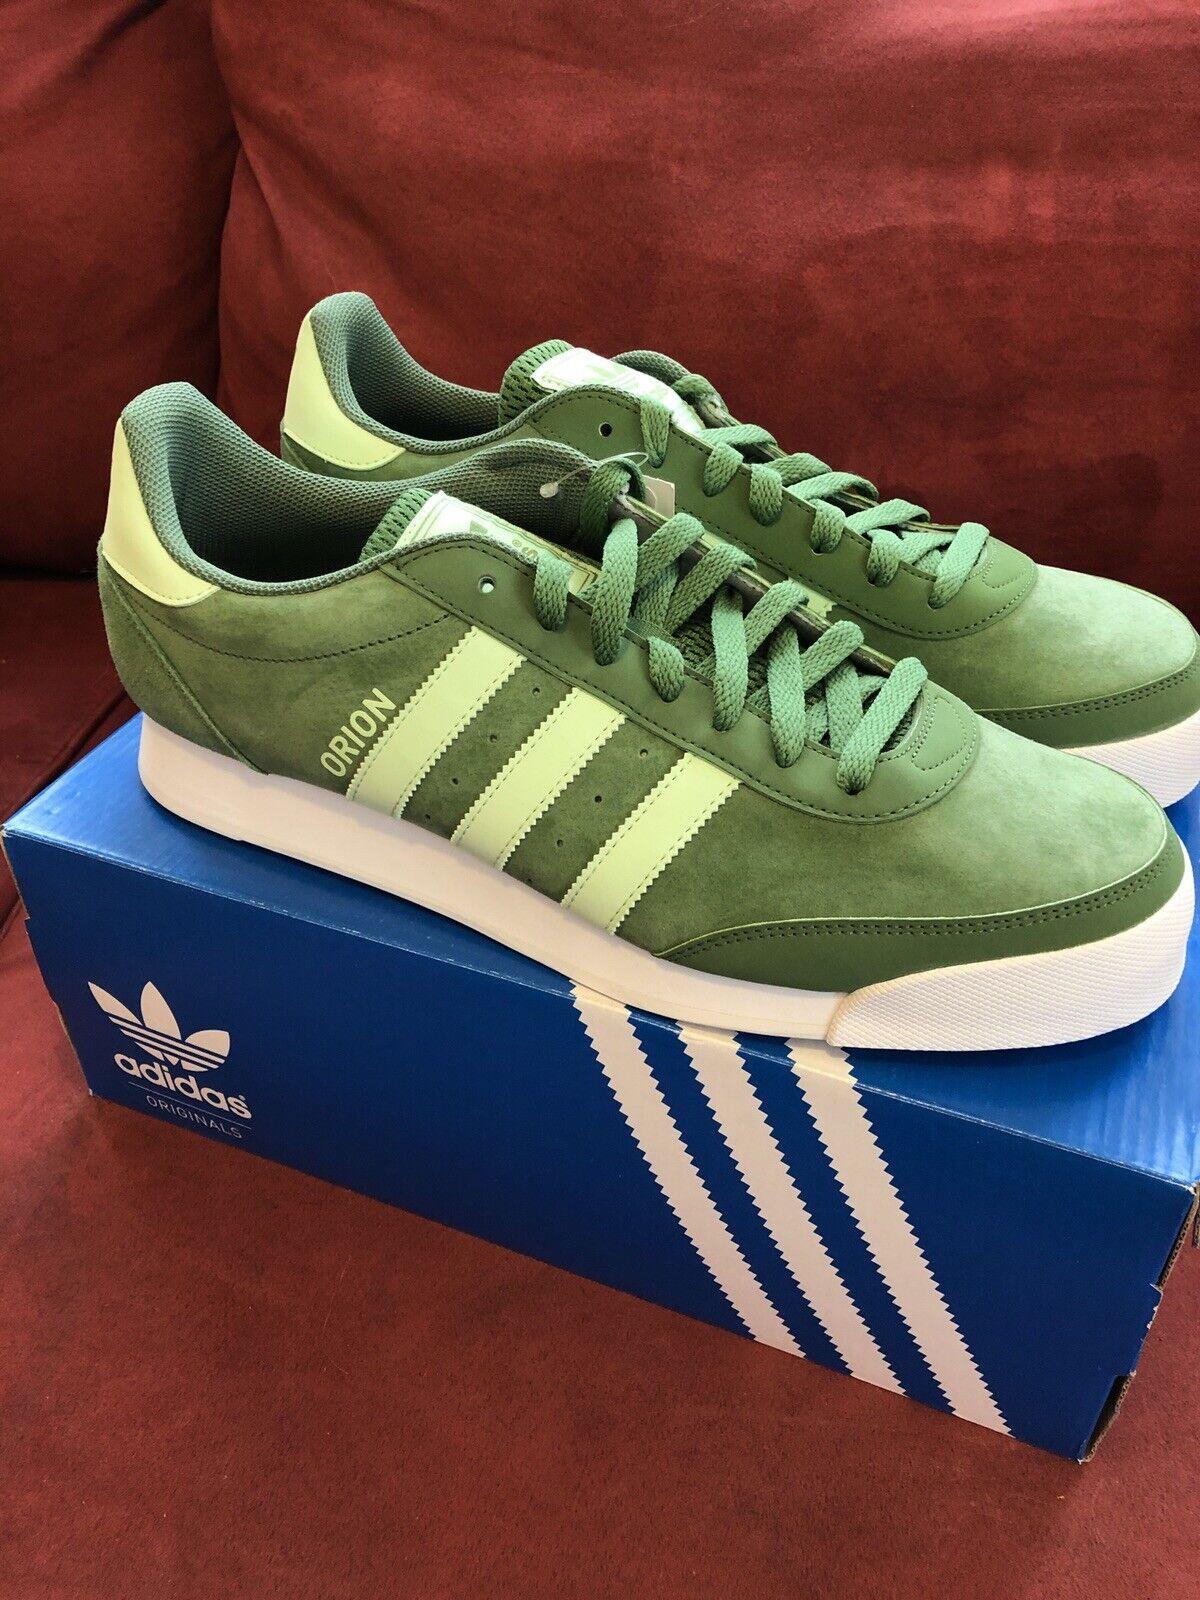 Adidas Originals Orion US 13